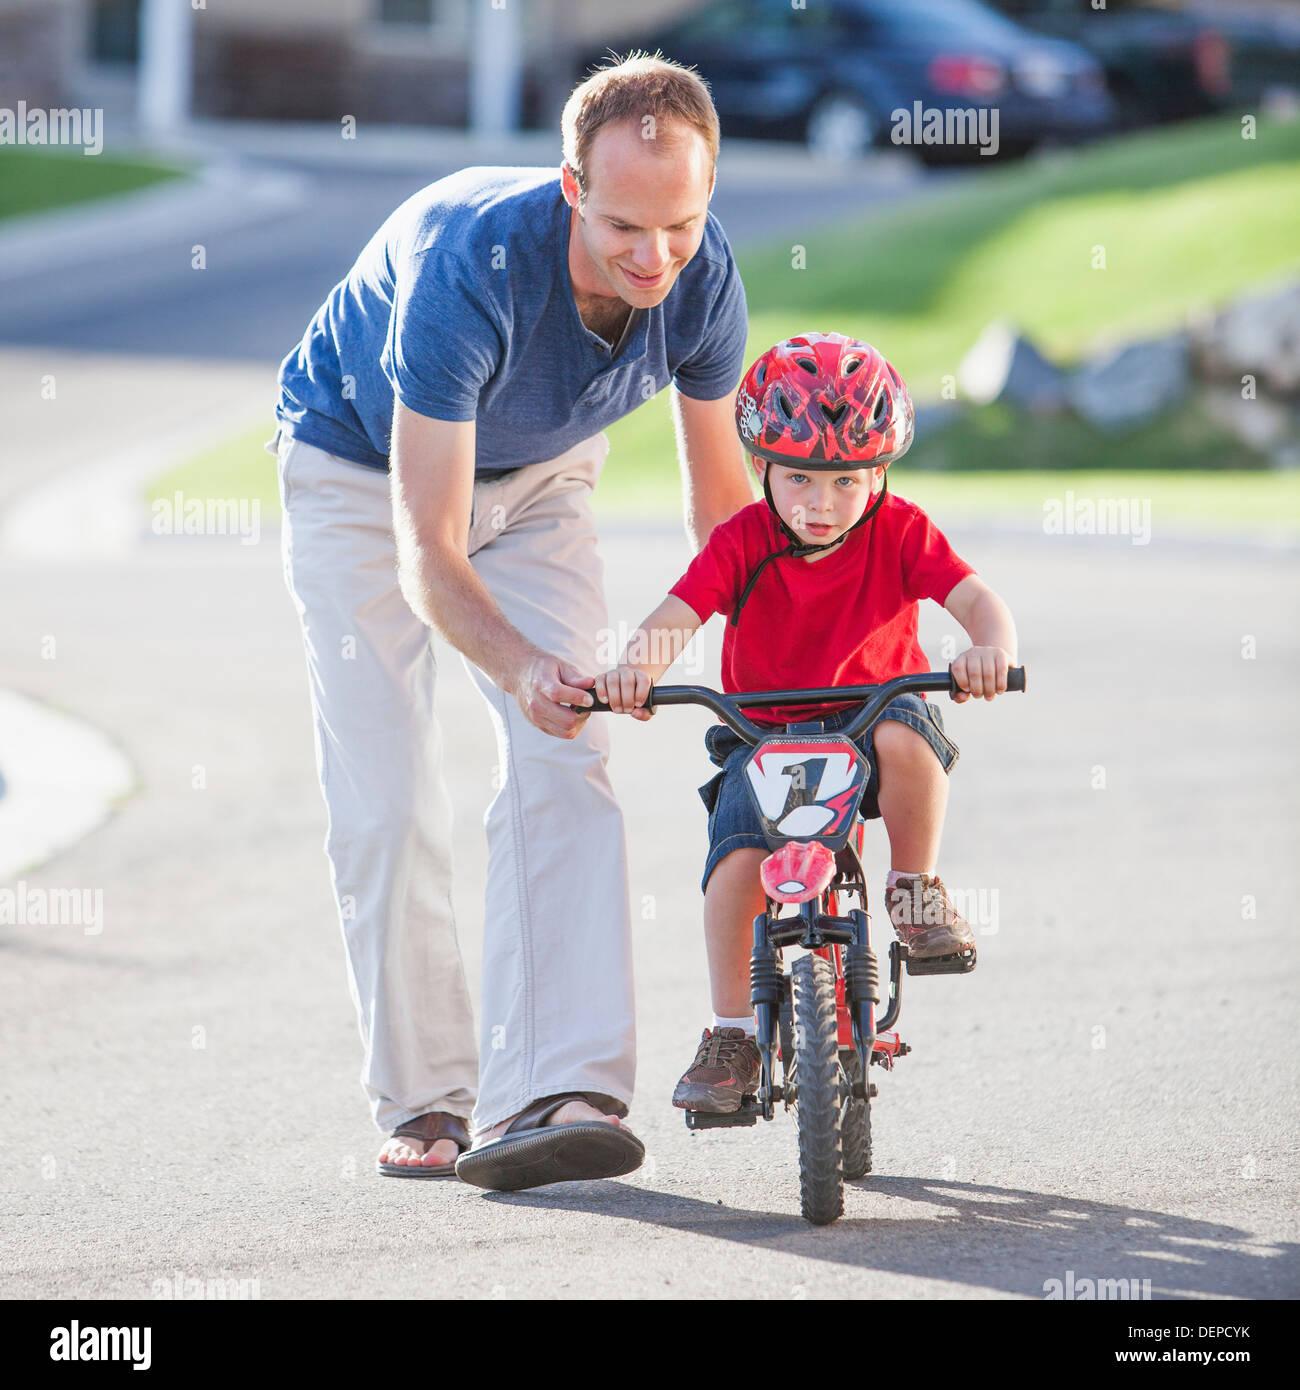 Hijo de padre caucásico enseñando a andar en bicicleta Foto de stock